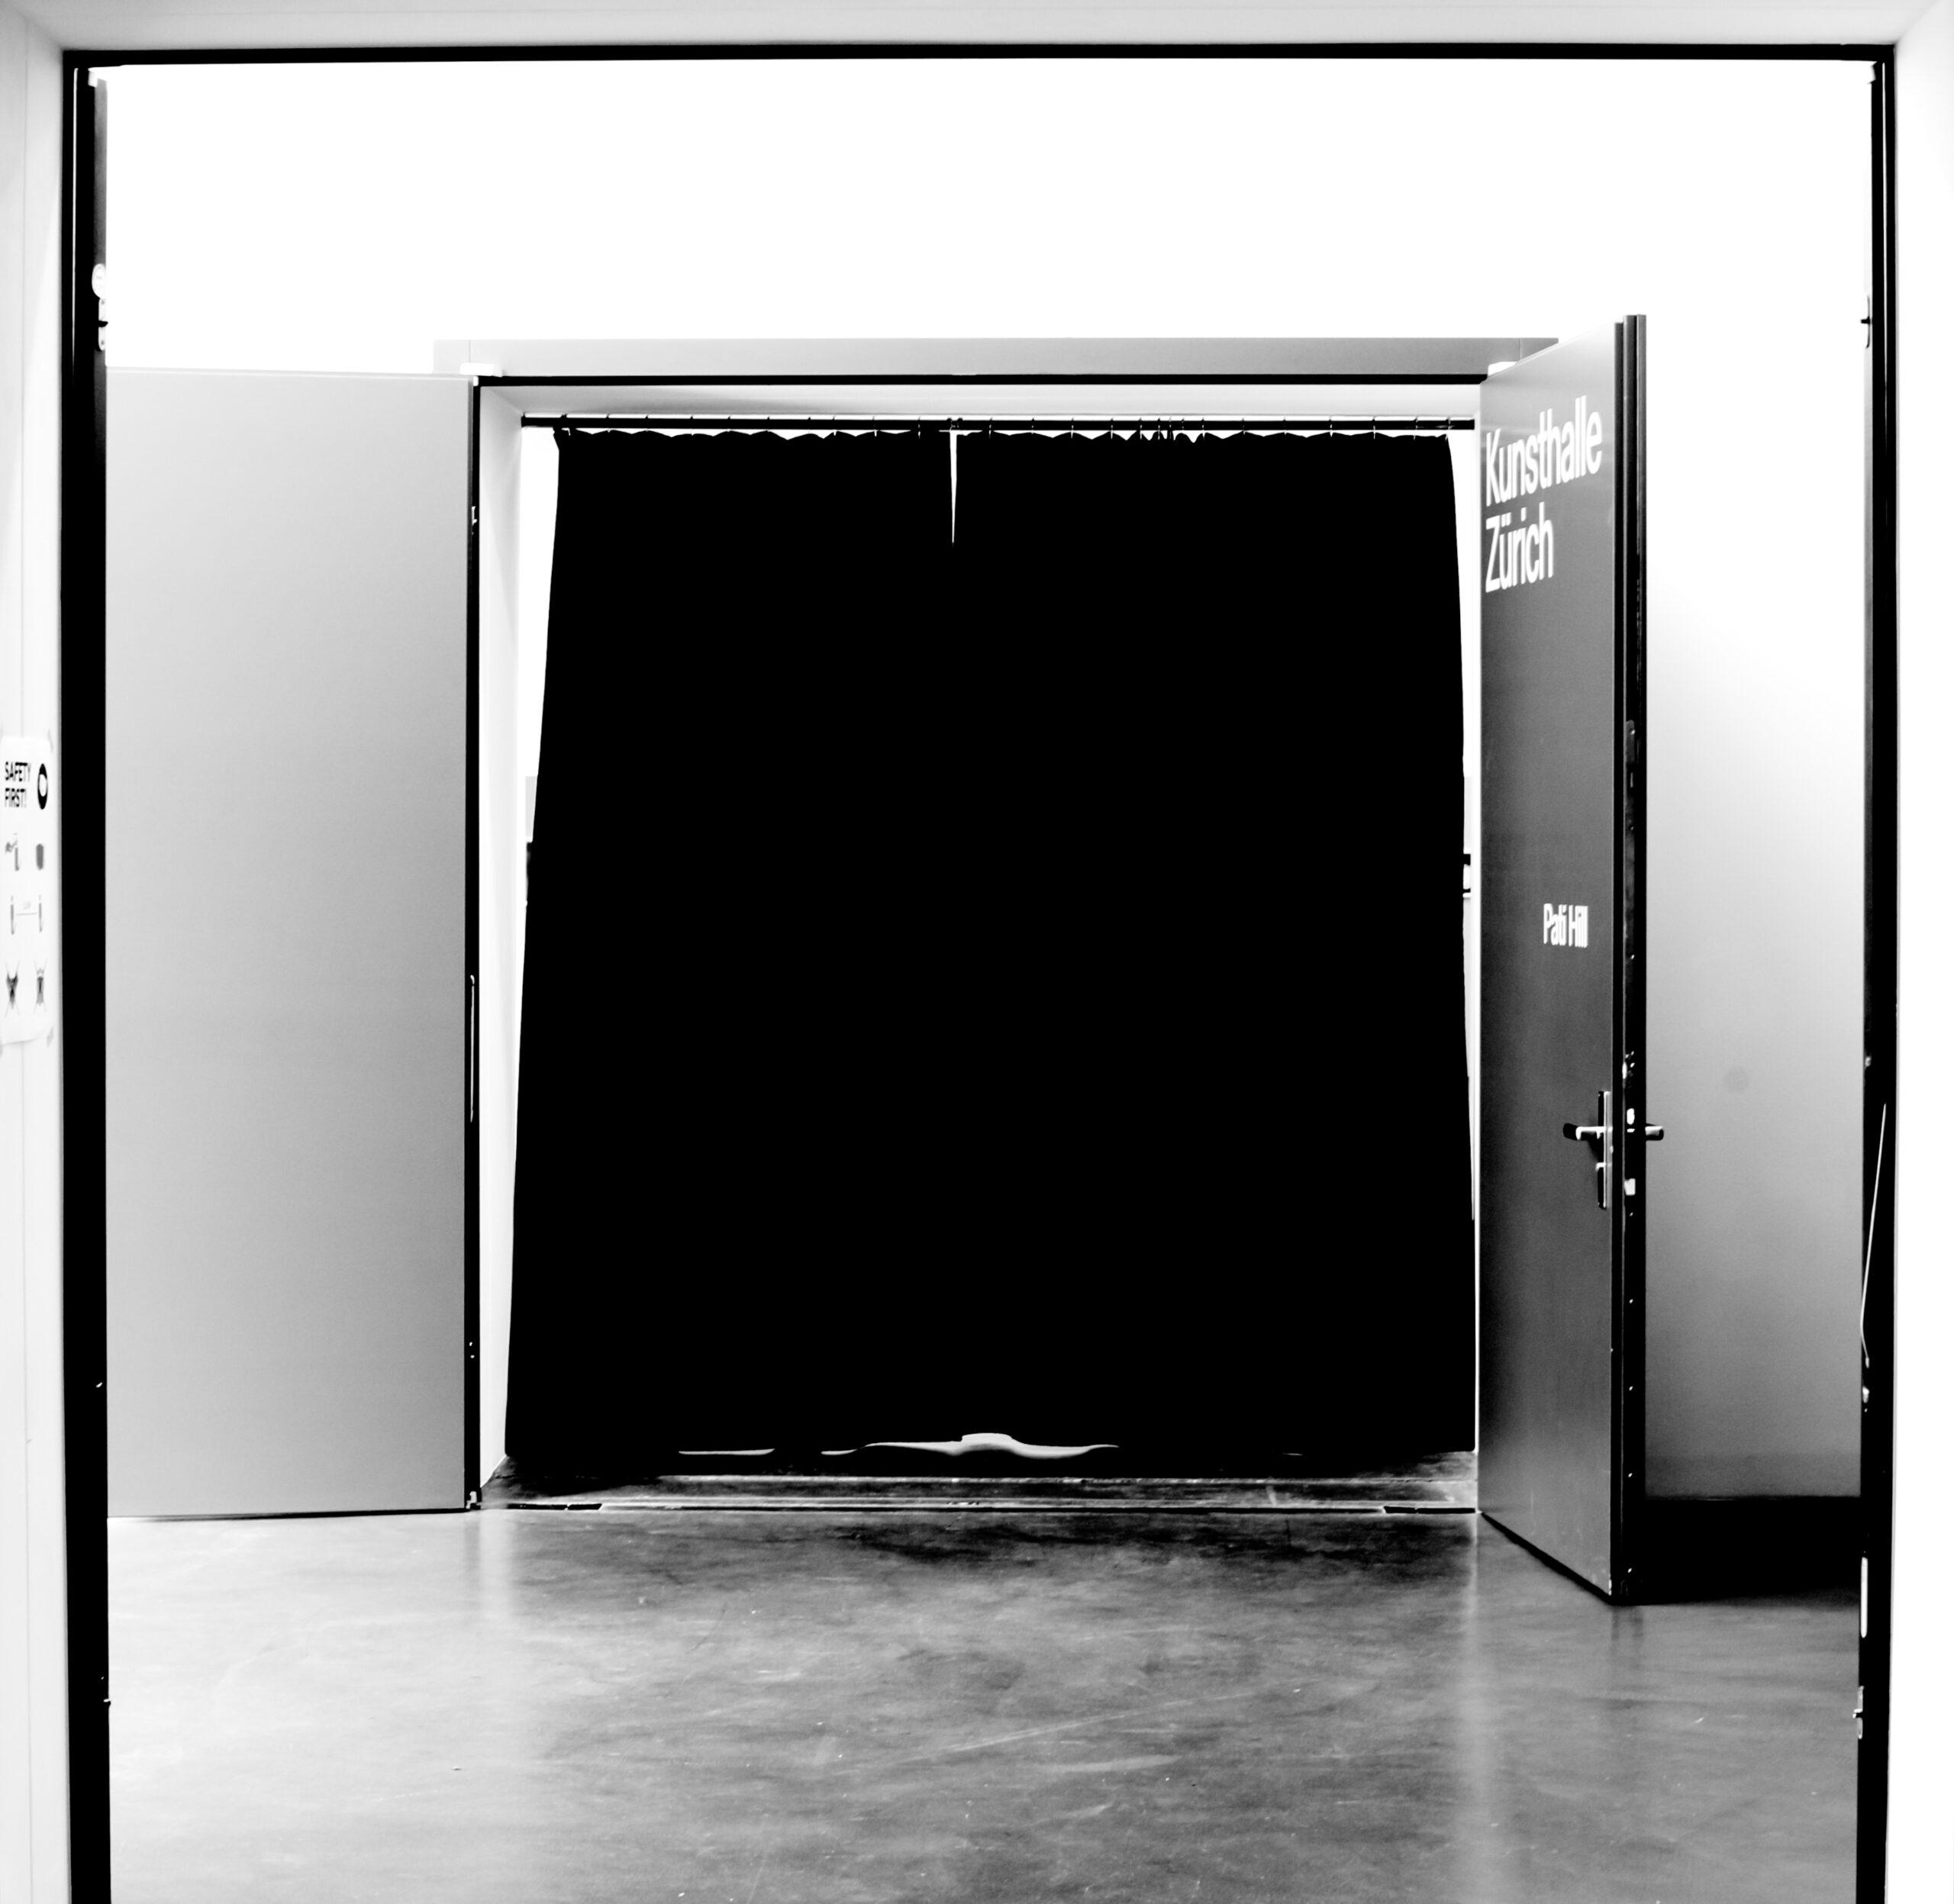 Kunsthalle Zürich (Foto: StC)